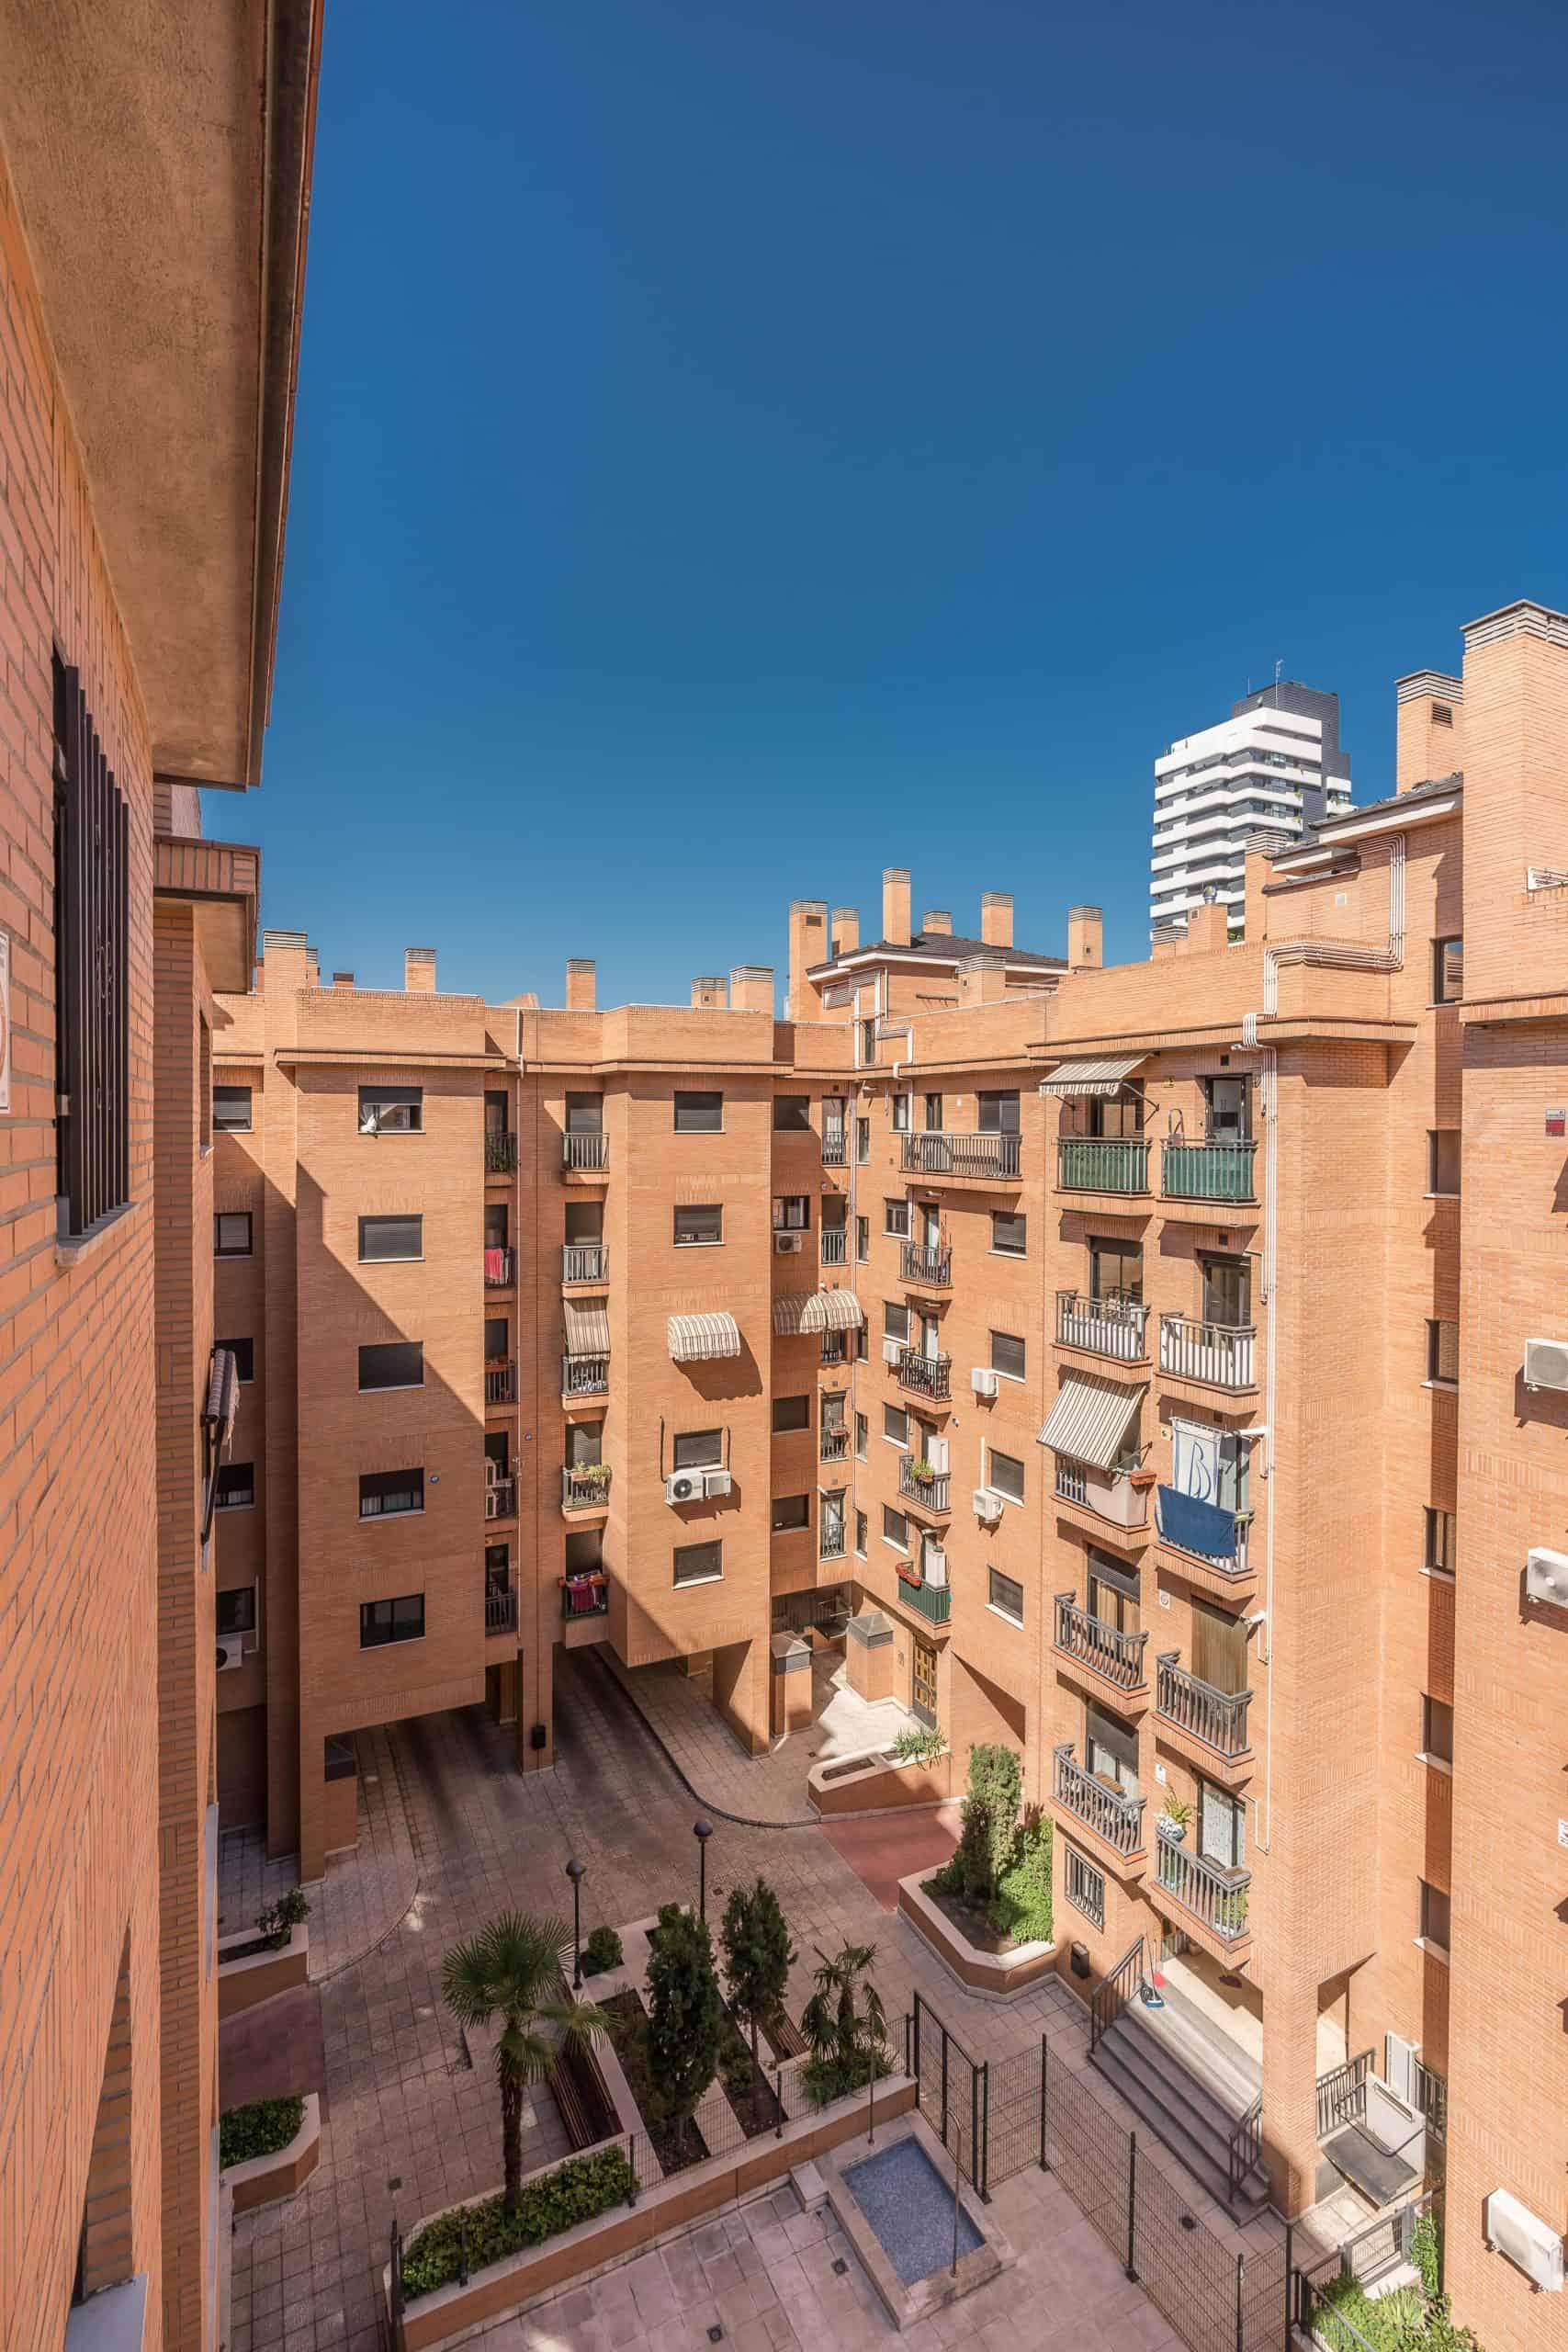 Agencia Inmobiliaria de Madrid-FUTUROCASA-Zona ARGANZUELA-EMBAJADORES-LEGAZPI13 VISTAS (5)